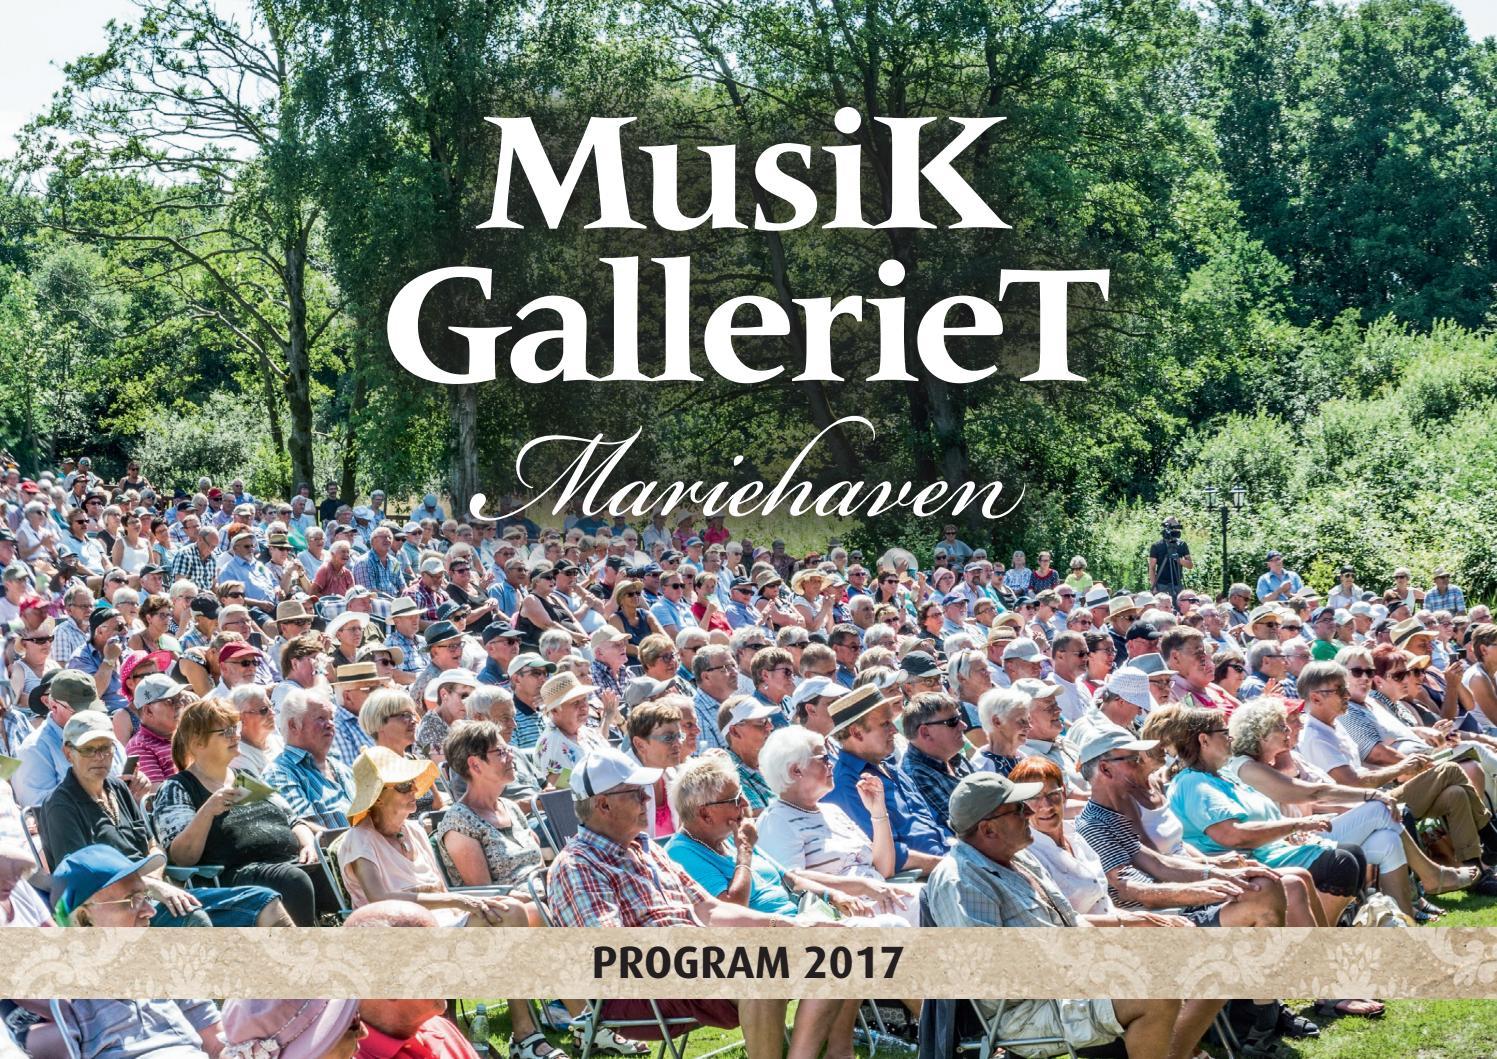 Musik Galleriet Mariehaven Program 2017 By Videbaek Bogtrykkeri